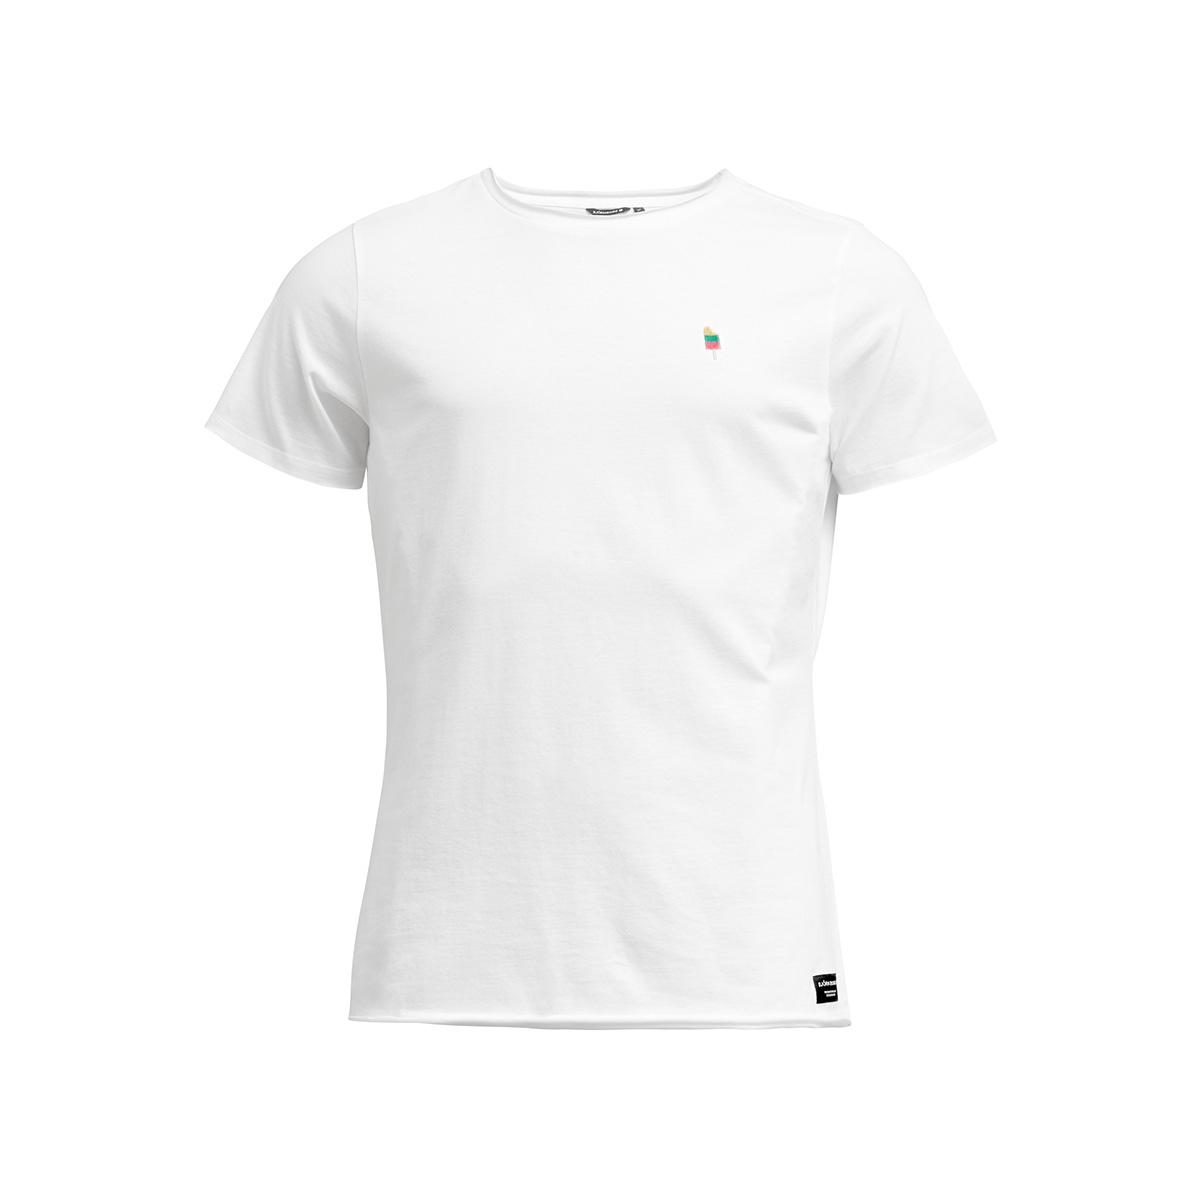 summer tee 2011 1066 bjorn borg t-shirt 00071 brilliant white